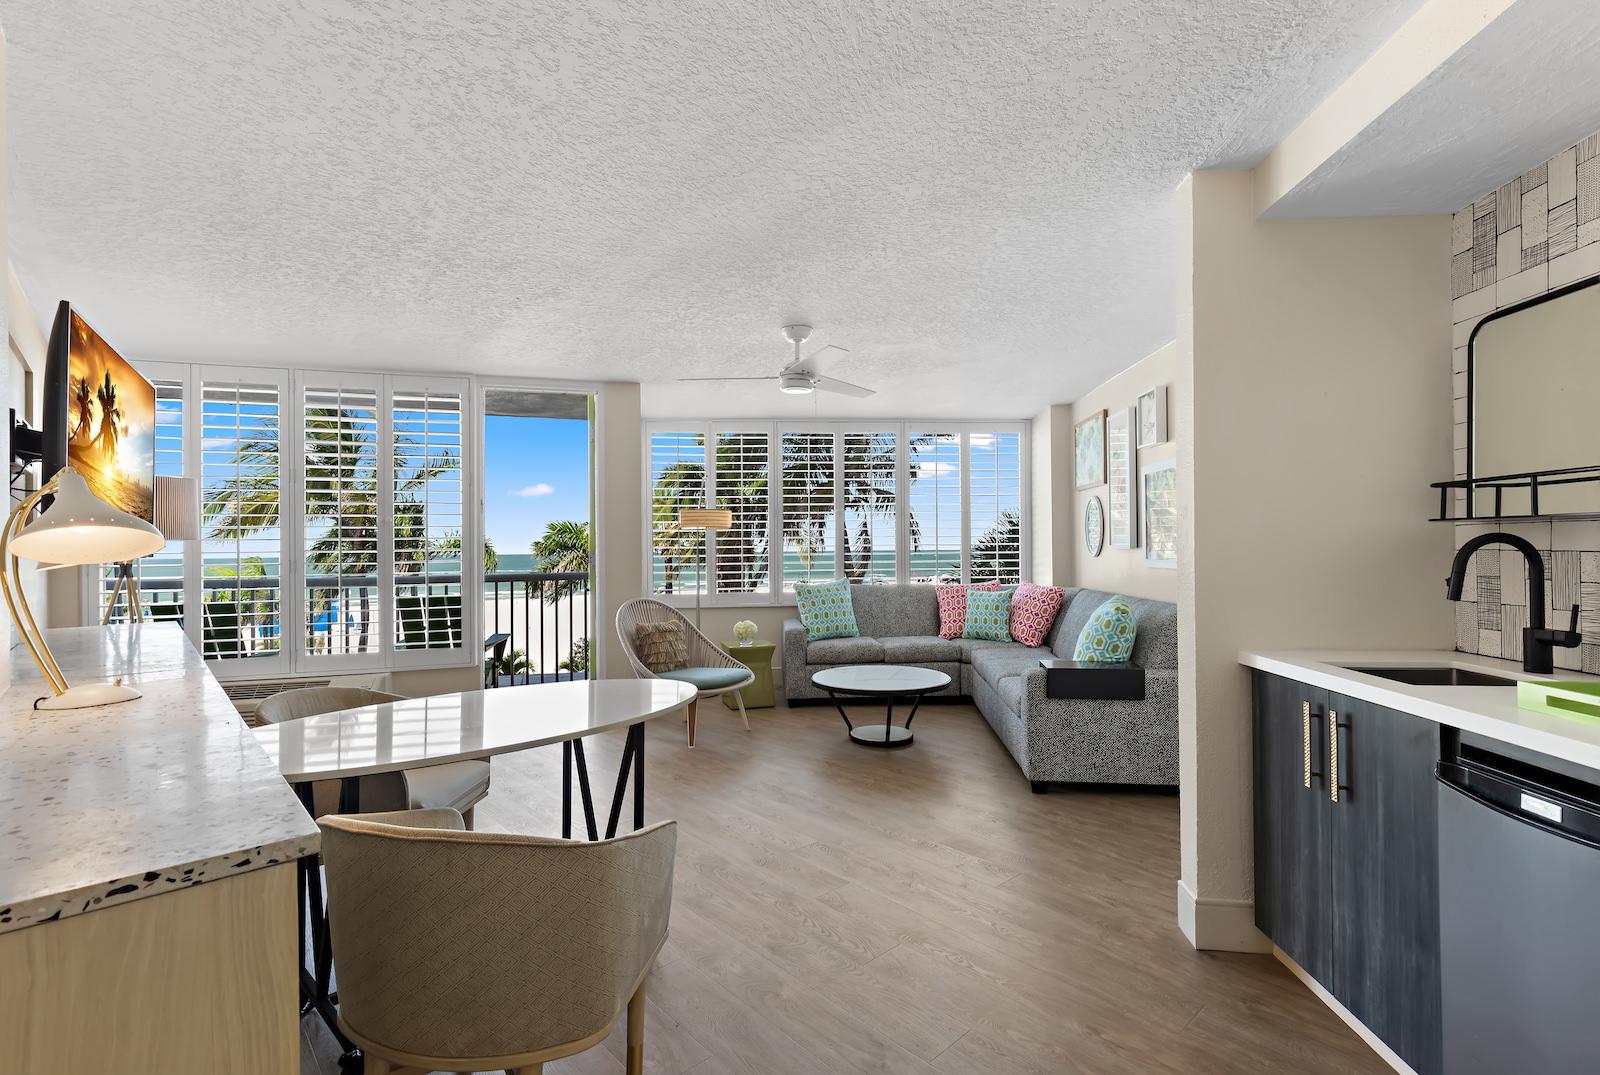 St. Pete Beach Wedding Venue Hotel Suite Bellwether Beach Resort